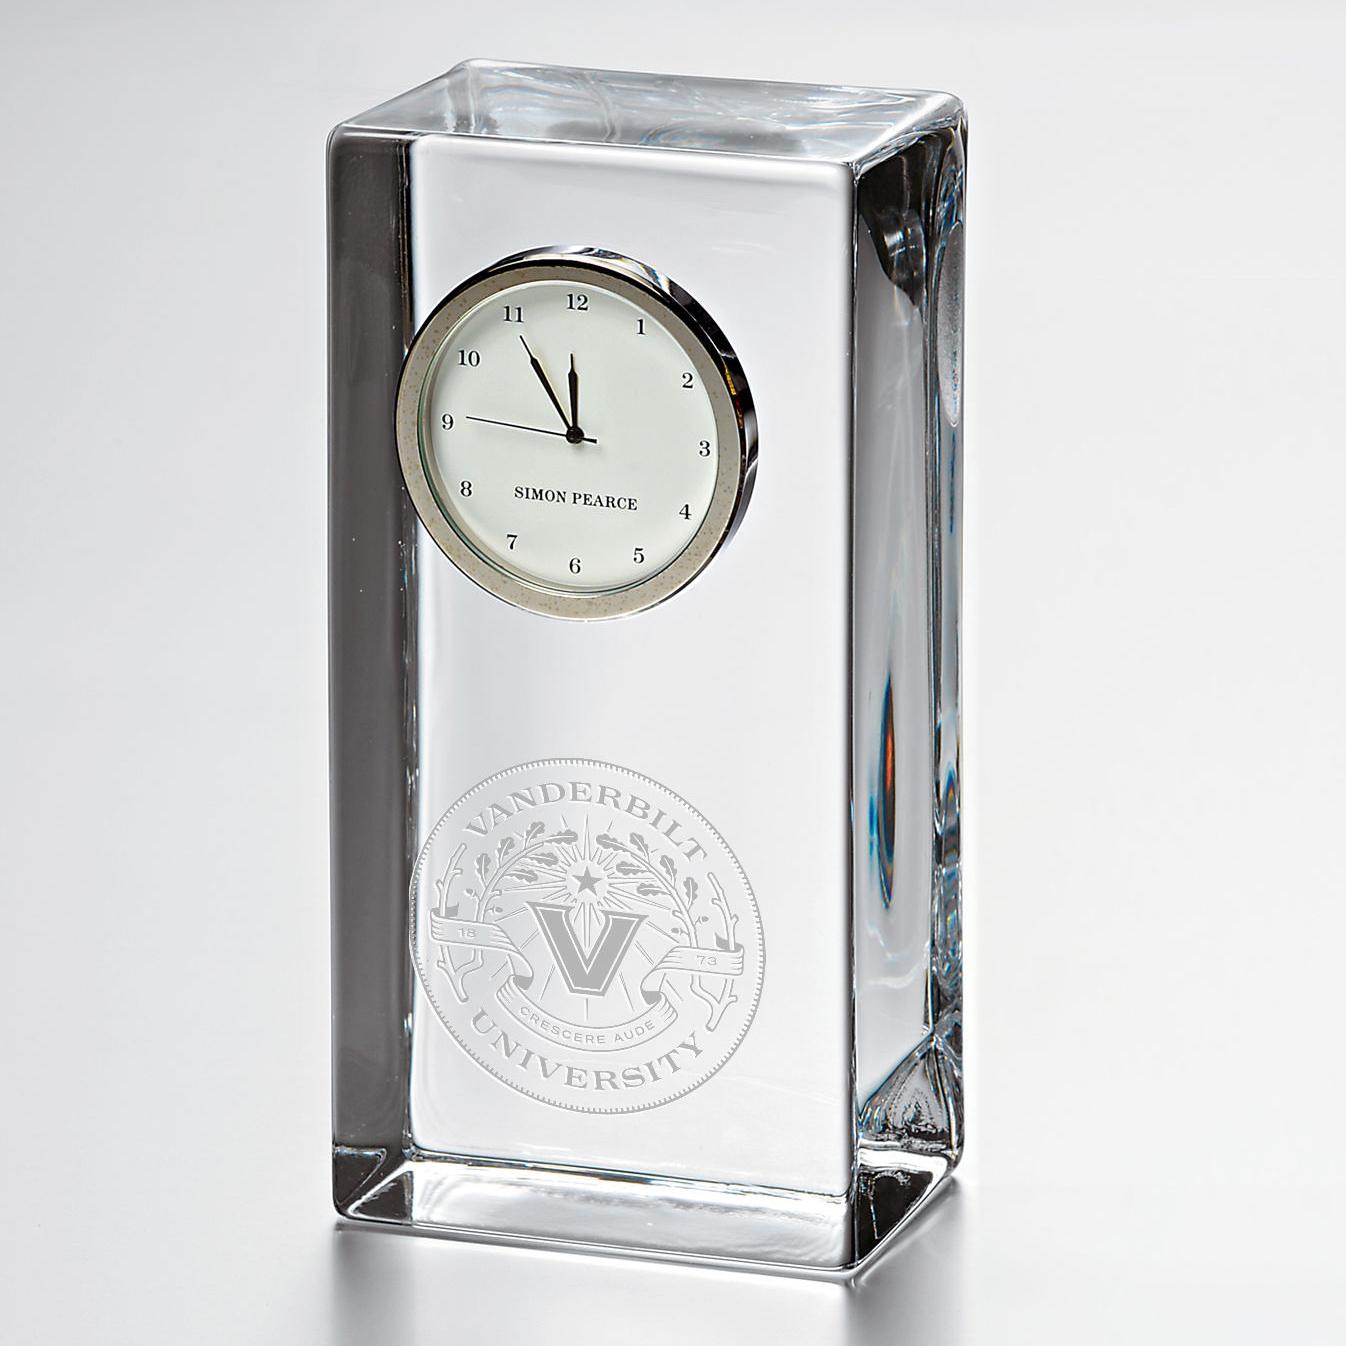 Vanderbilt Tall Class Desk Clock by Simon Pearce